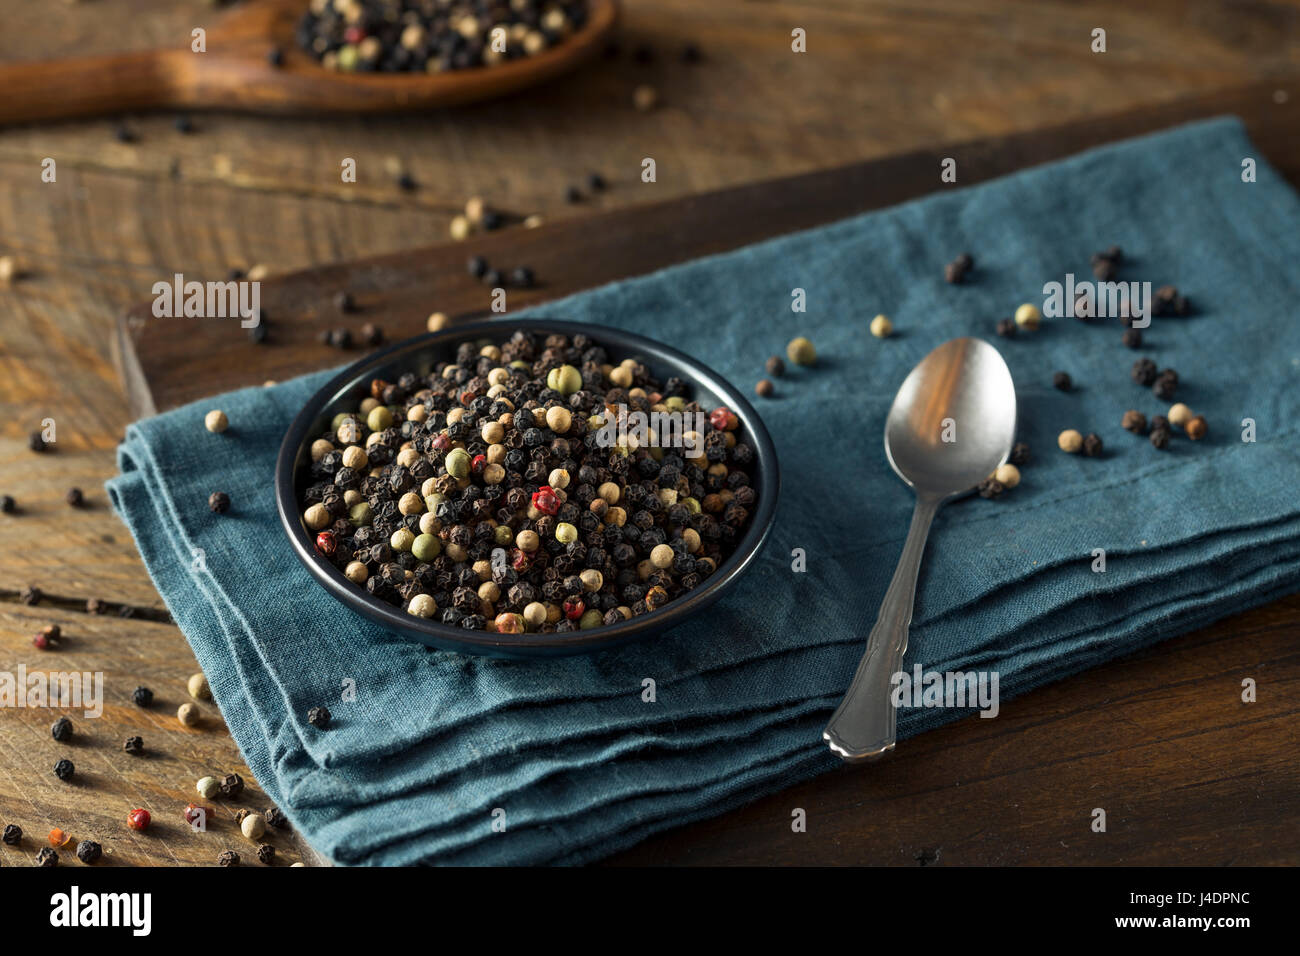 Raw Organic Mixed Peppercorns Ready to Use - Stock Image